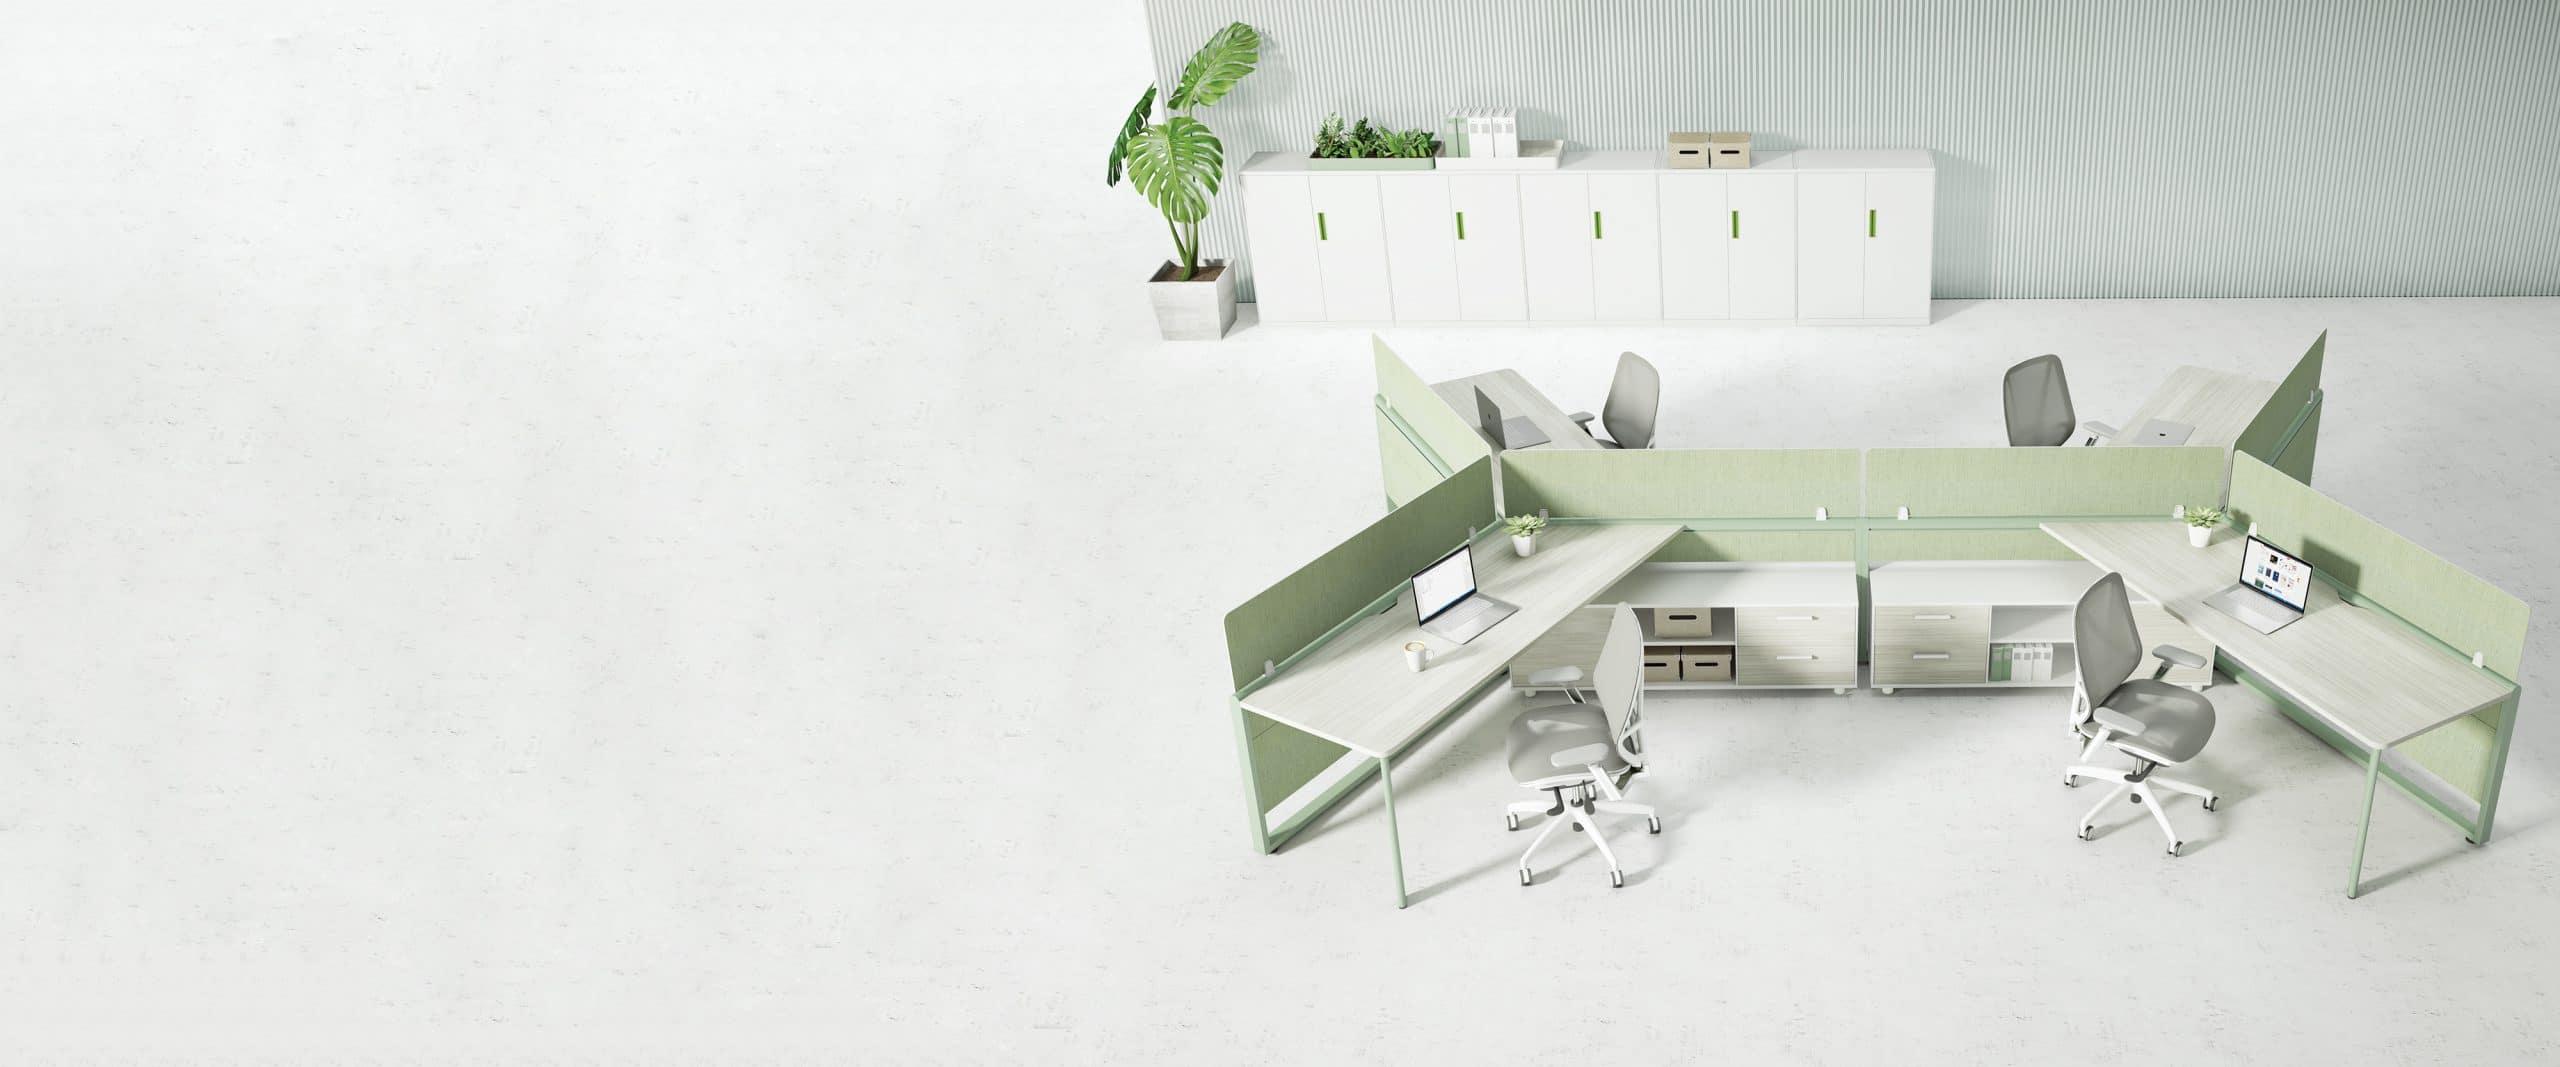 I-Tech Height Adjustable Table